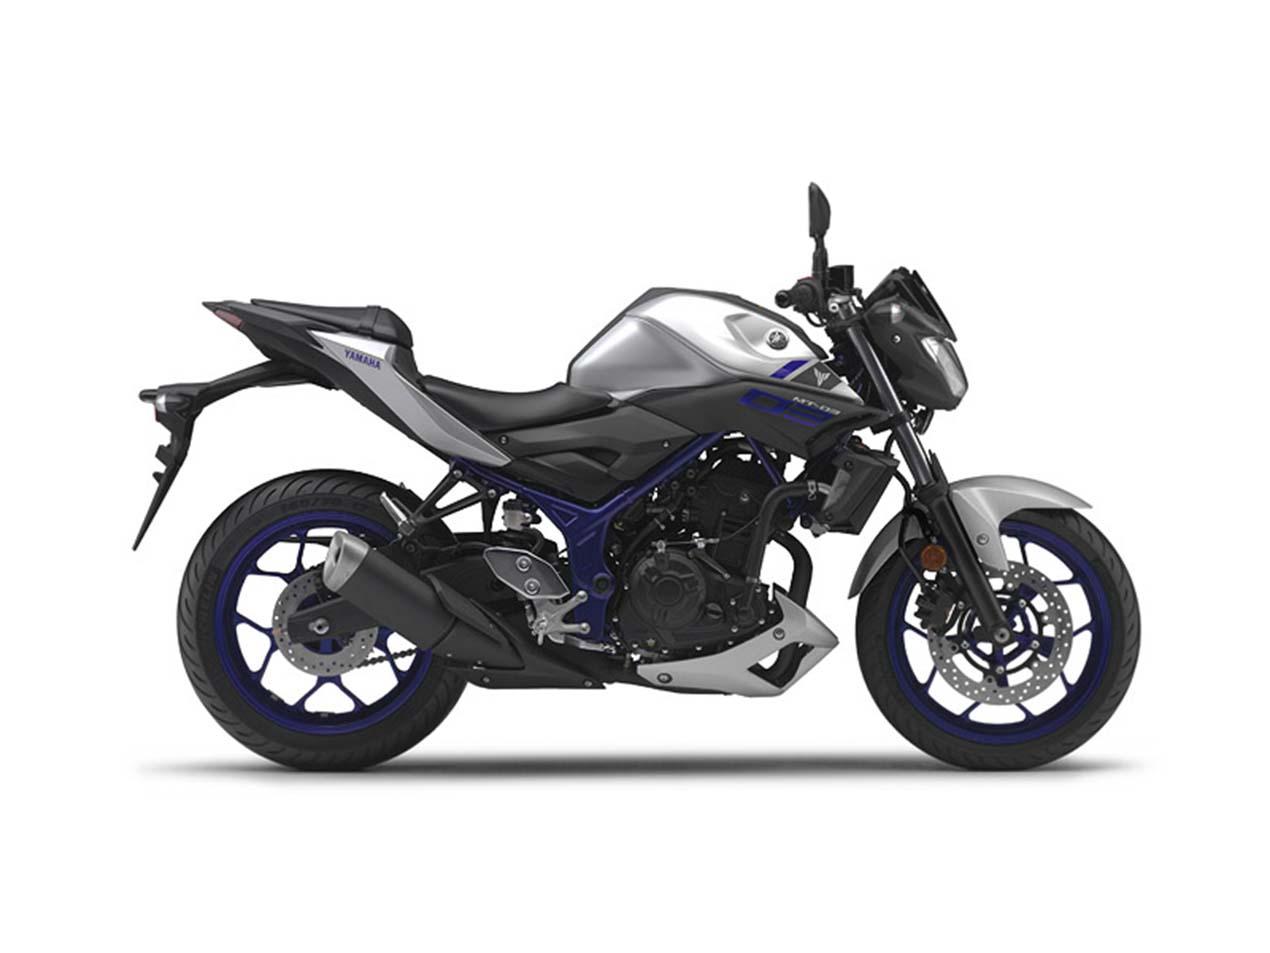 Yamaha Fz Colors